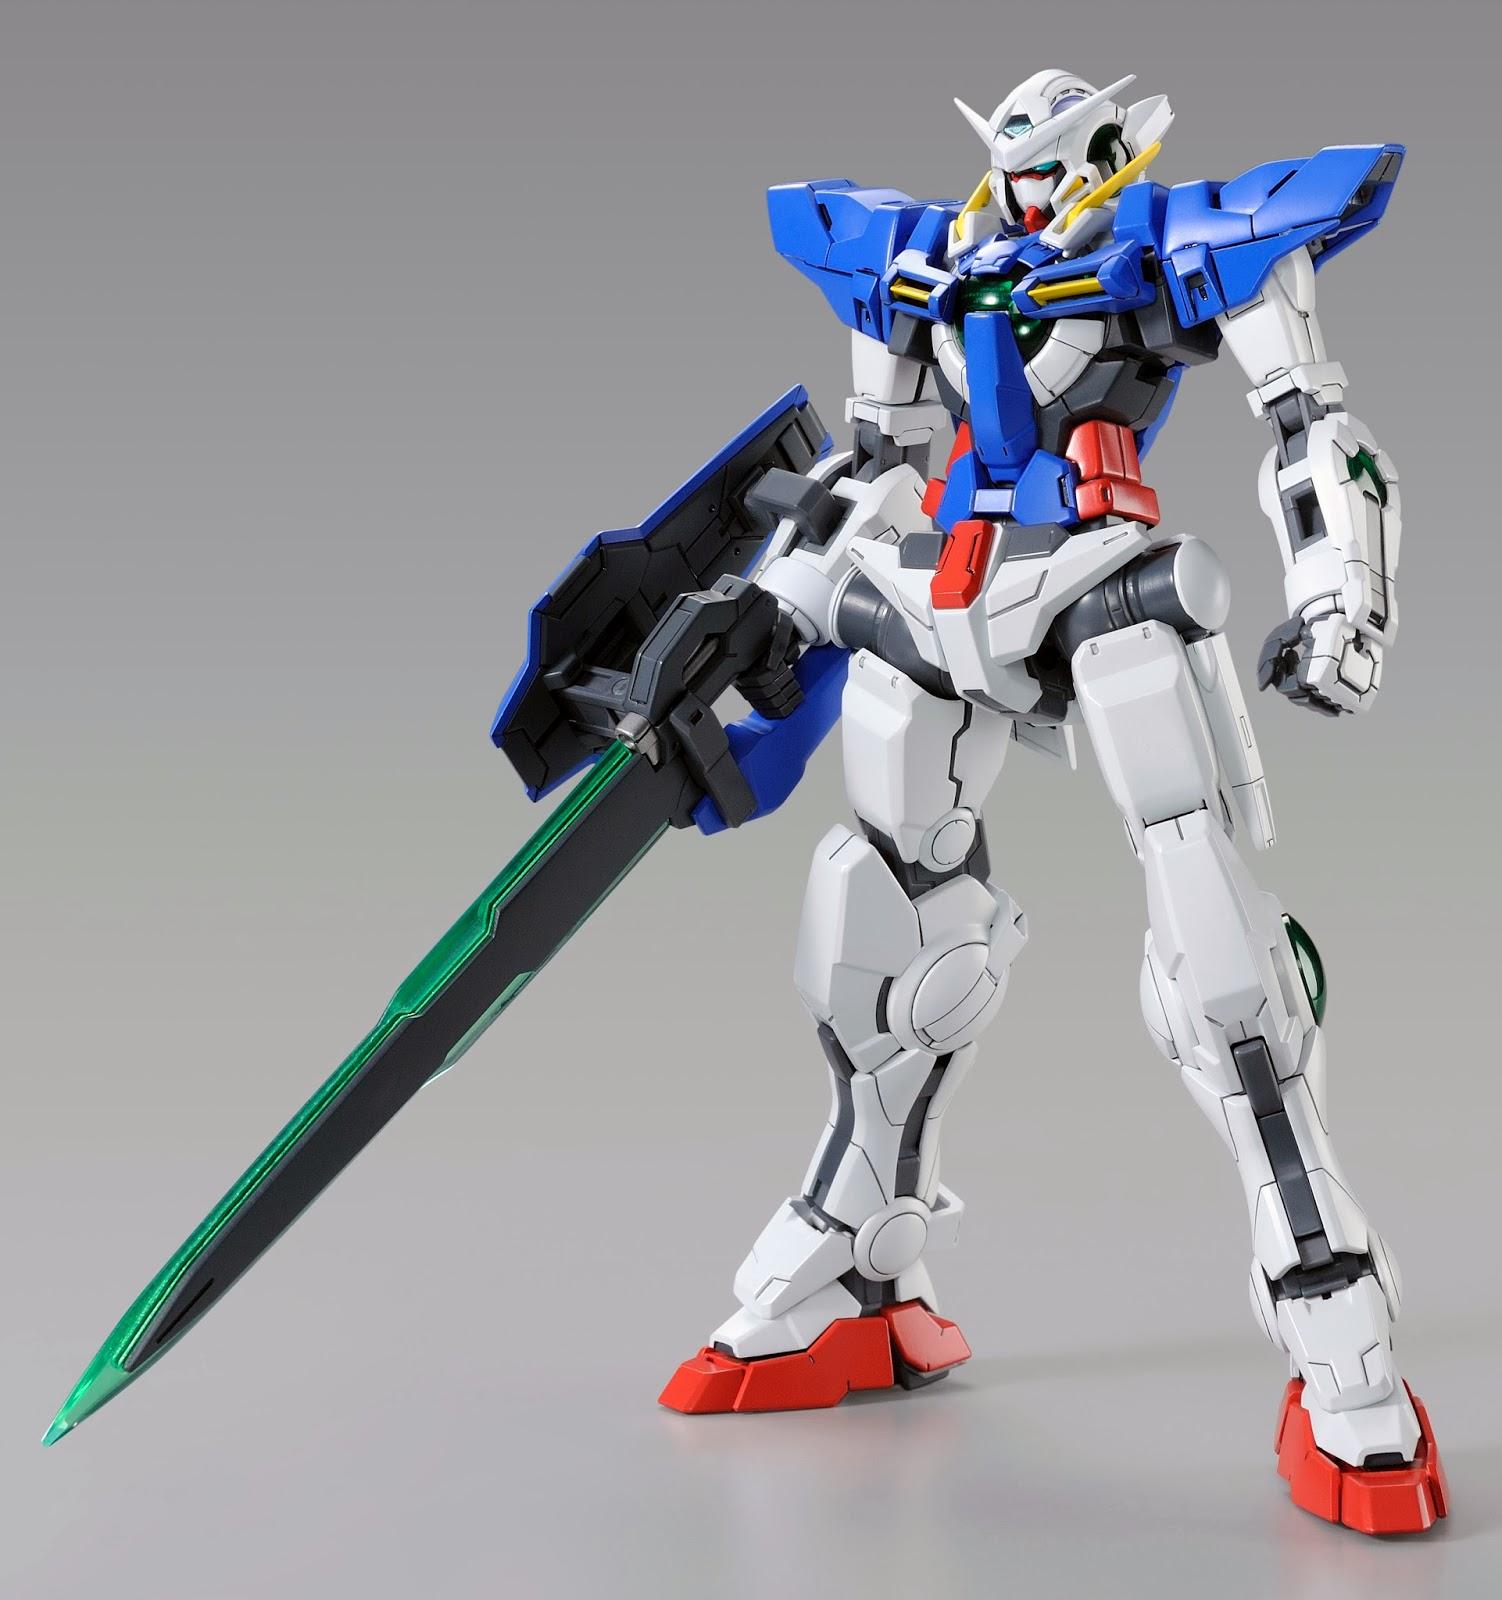 gundam exia model kit - HD1502×1600